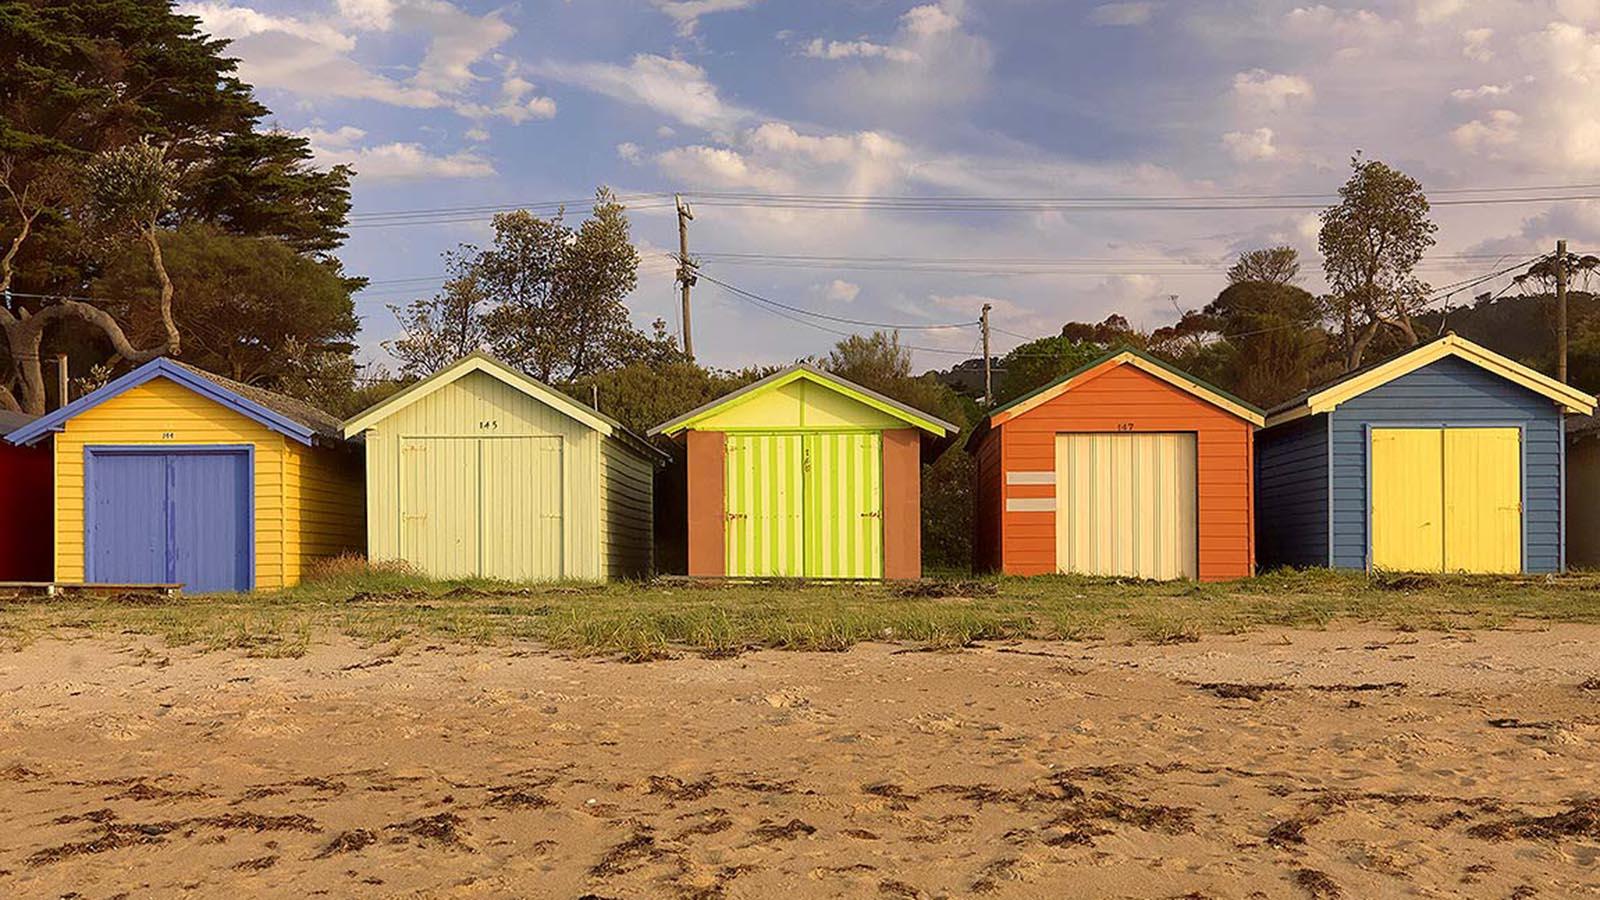 Beach boxes at Dromana, Mornington Peninsula, Victoria, Australia